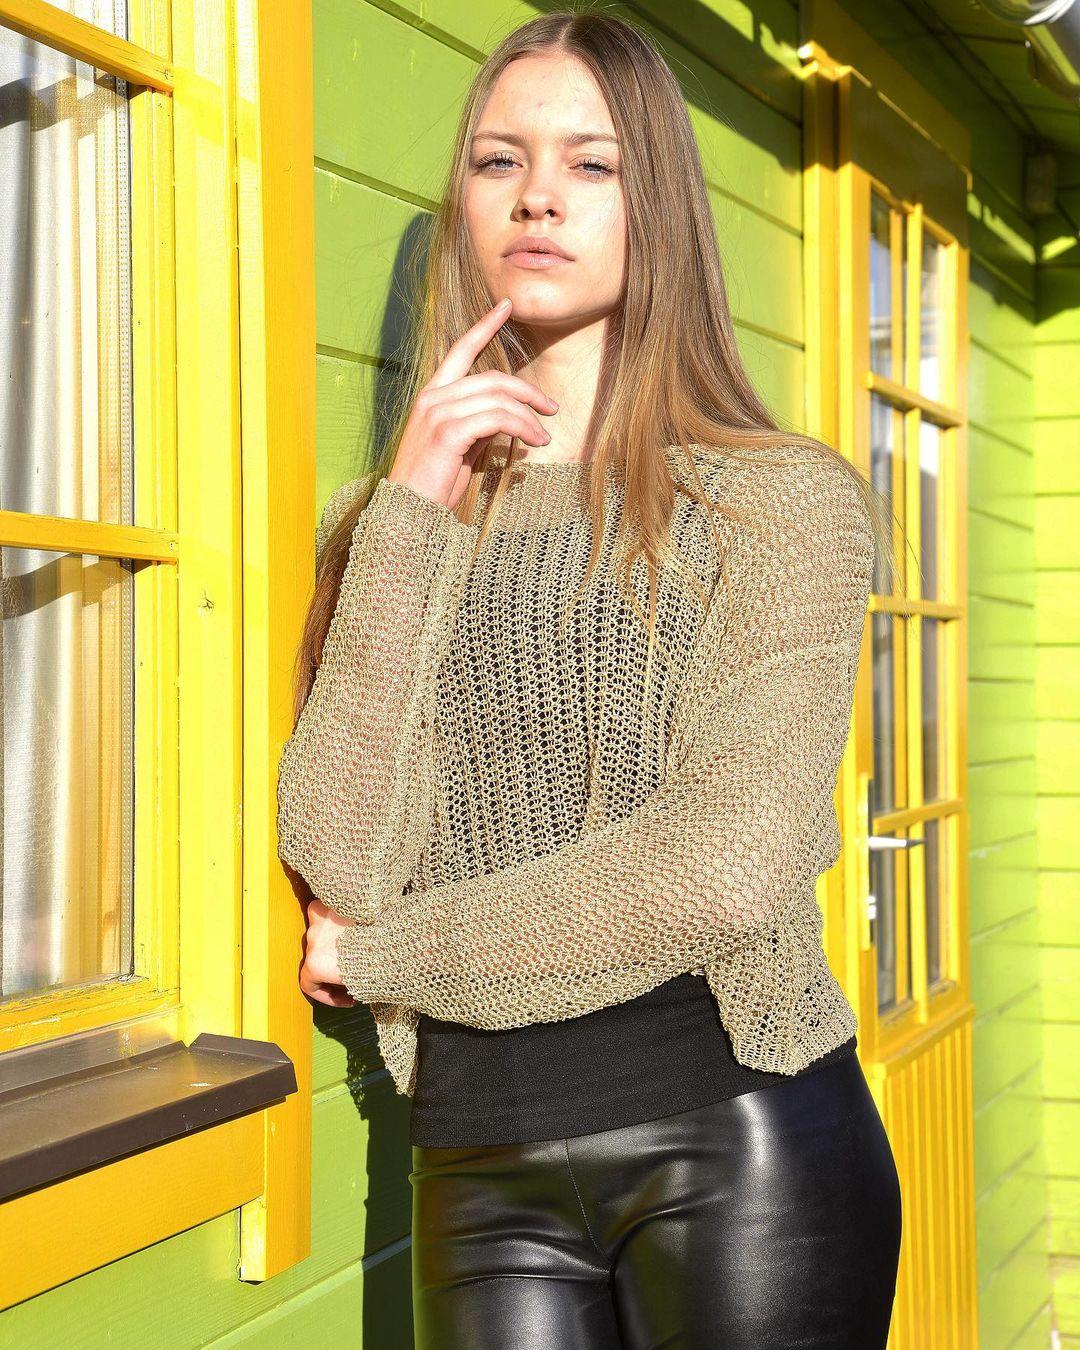 Klaudia-Nicole-Pietras-Wallpapers-Insta-Fit-Bio-7